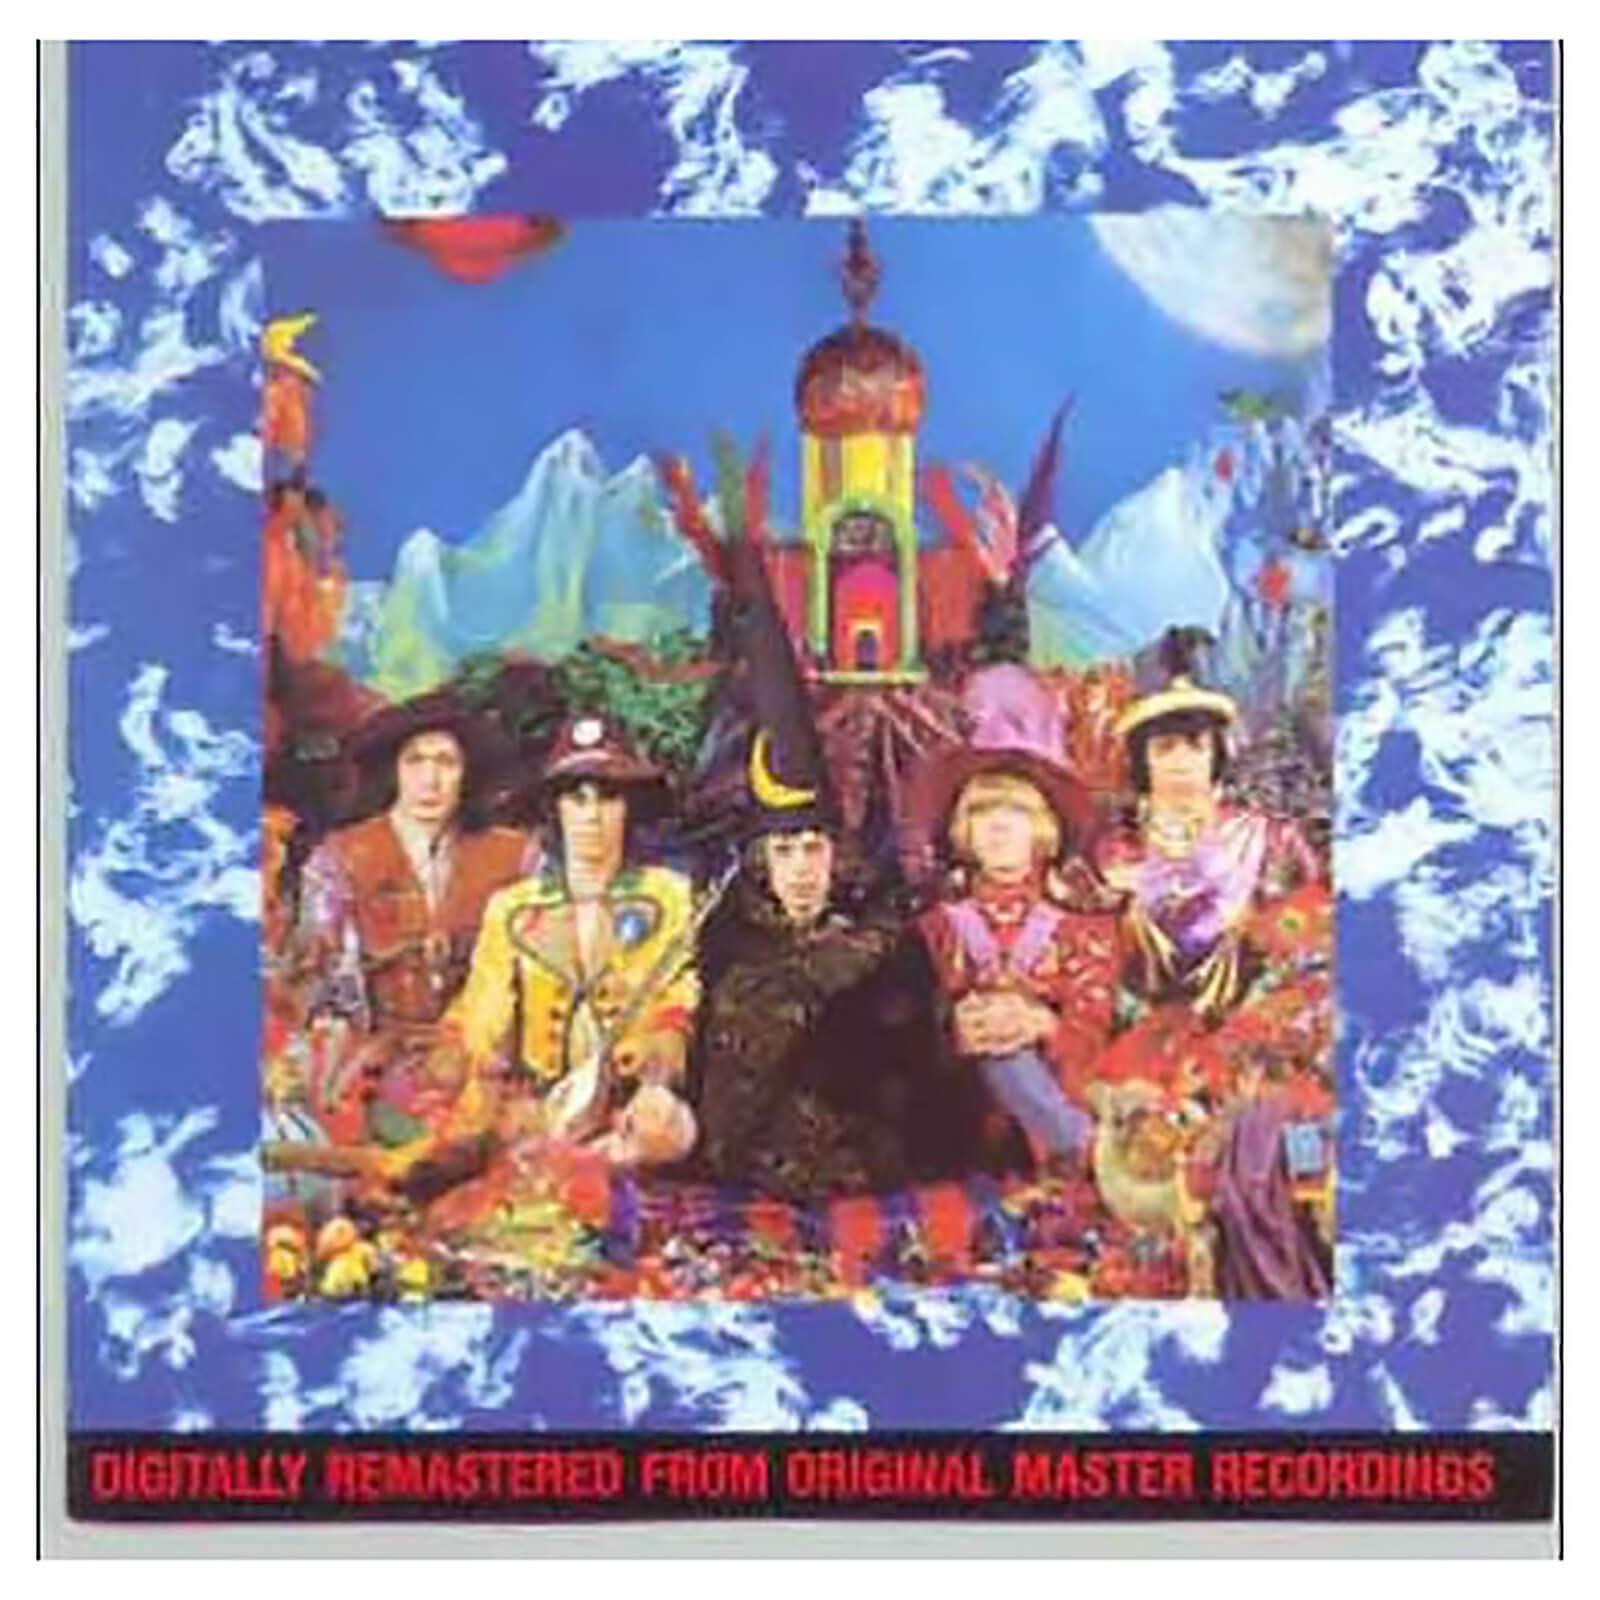 Decca The Rolling Stones - Their Satanic Majesties Request - Vinyl